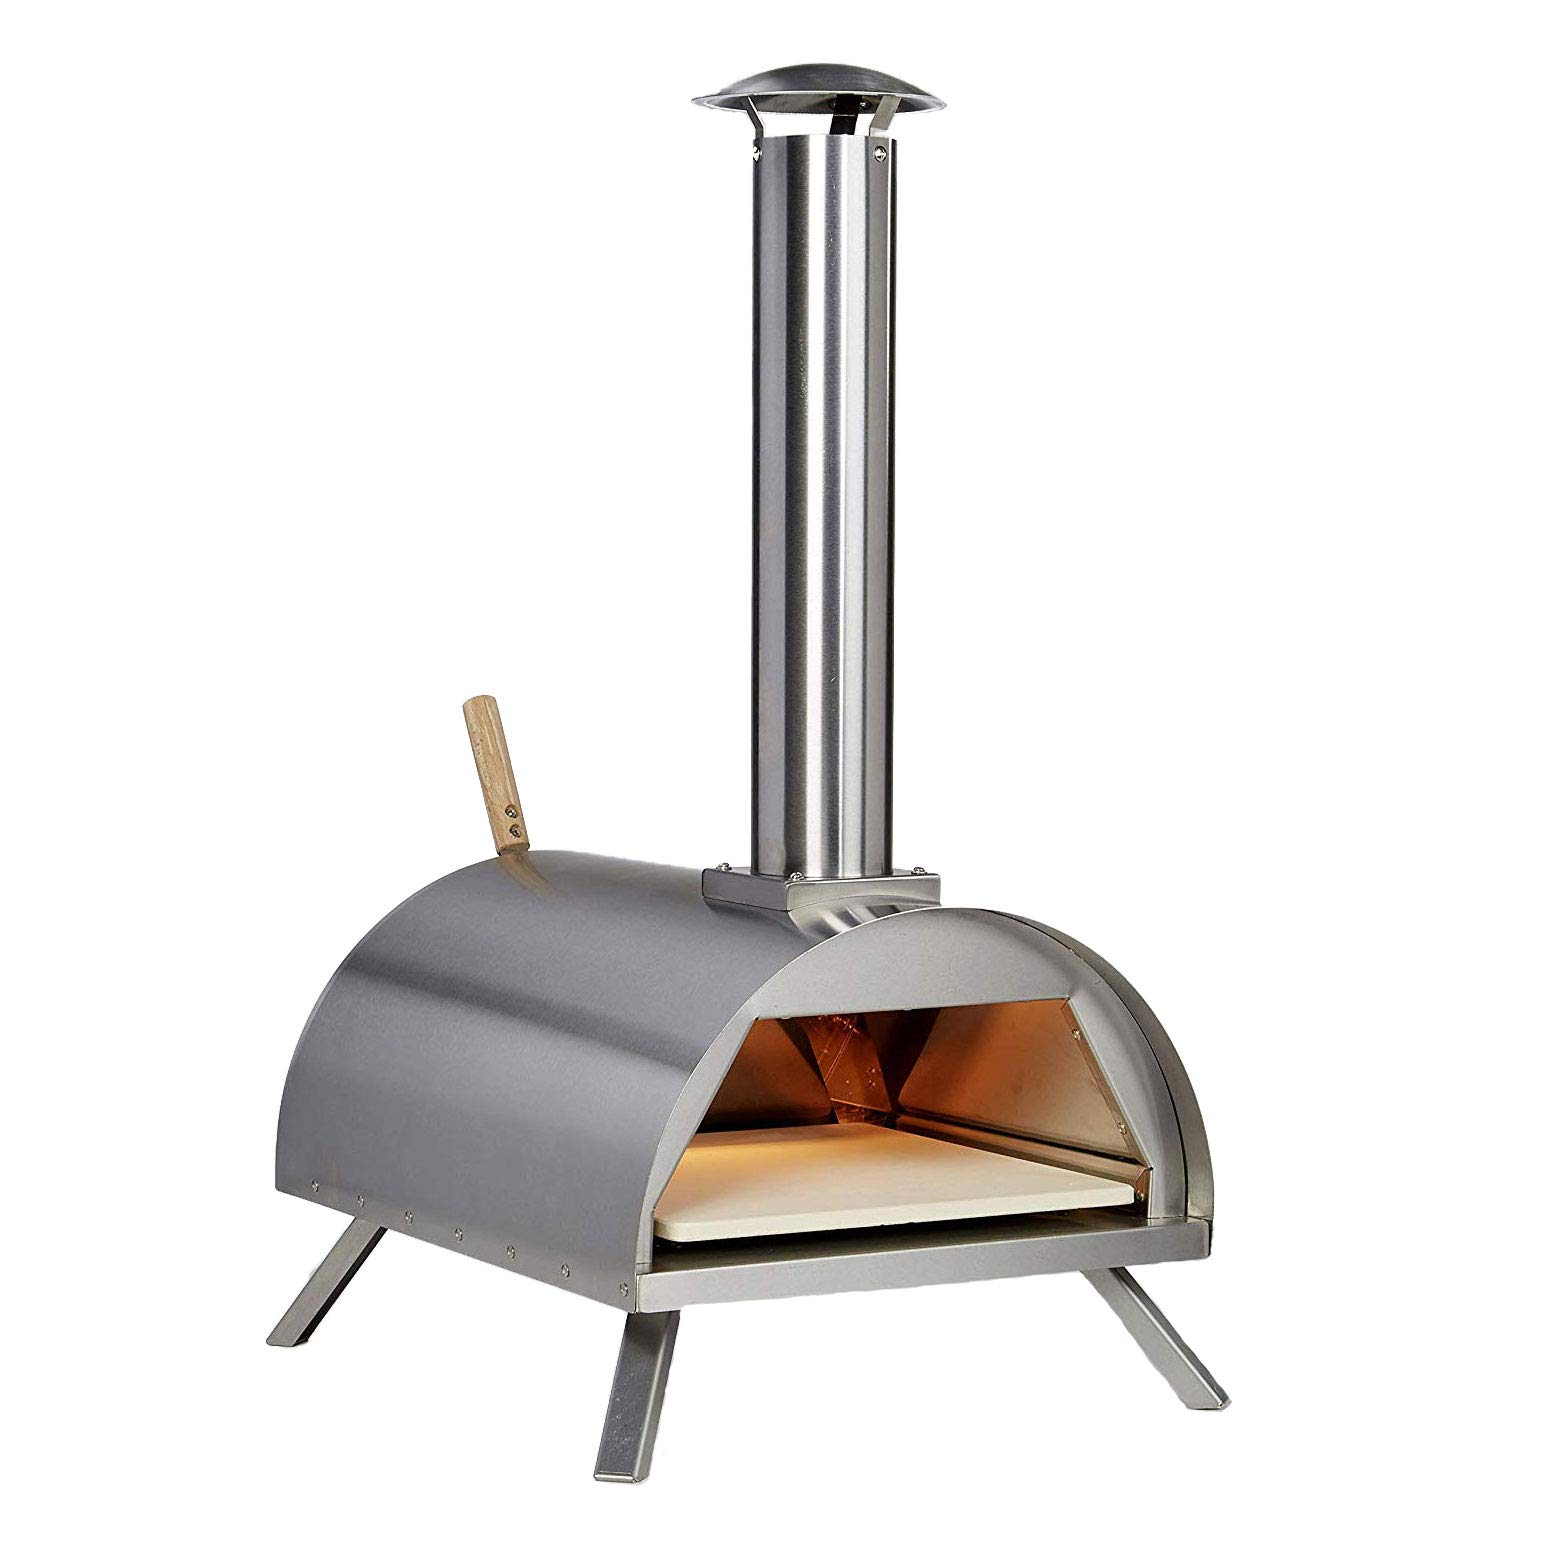 Wood Pellet Pizza Oven wppokit WPPO1 Portable, Stainless Steal by Wood Pellet Pizza Oven